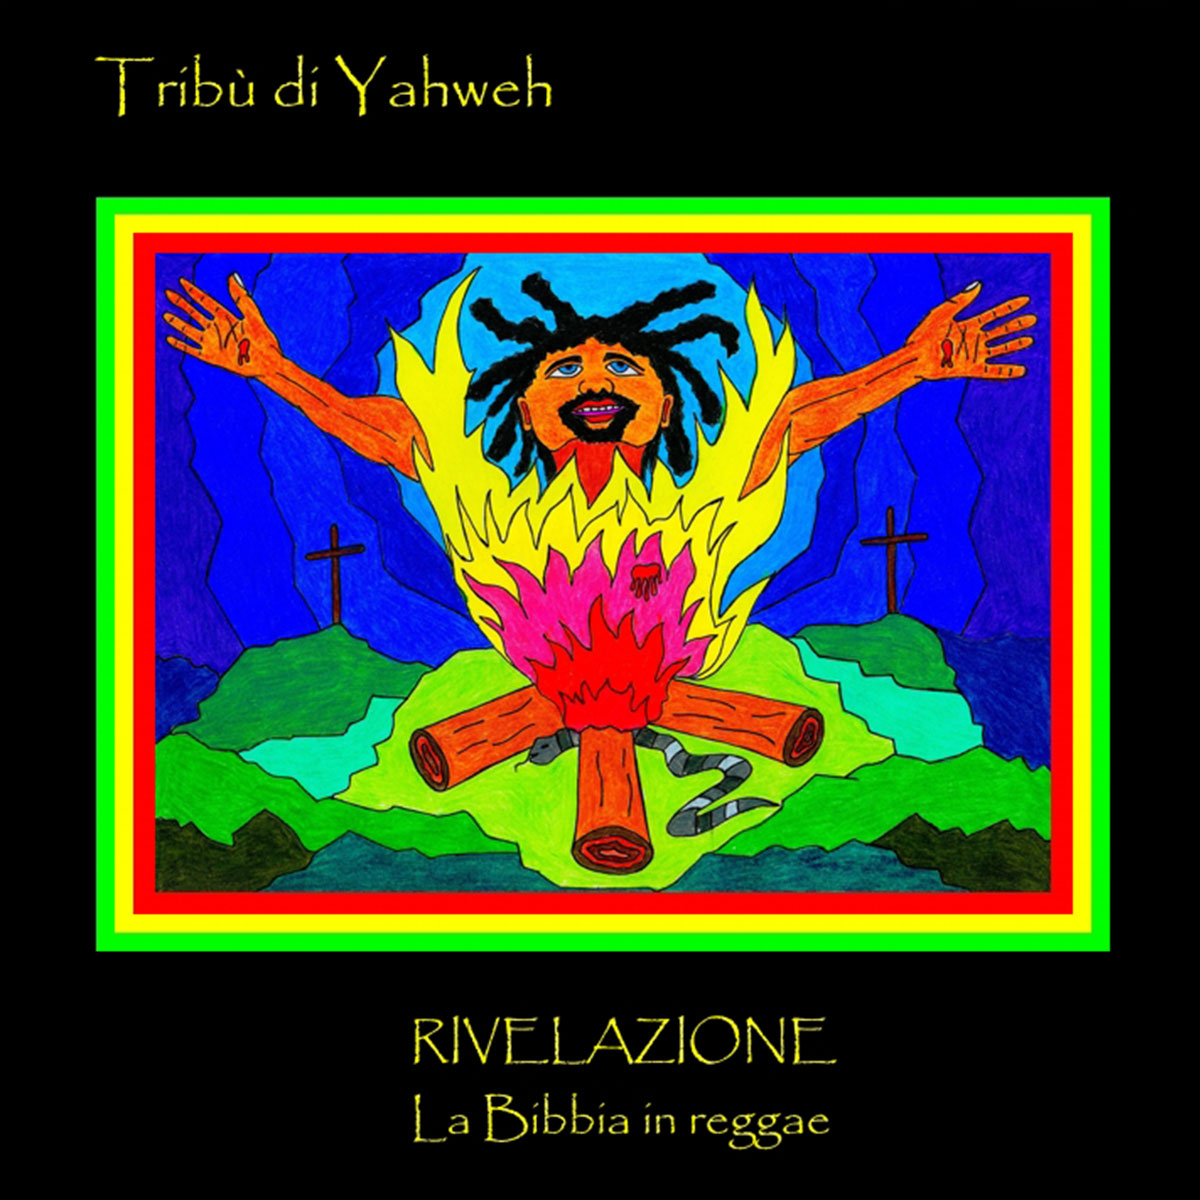 http://www.tribudiyahweh.com/wp/wp-content/uploads/2019/02/RIVELAZIONE-la-Bibbia-in-reggae.jpg